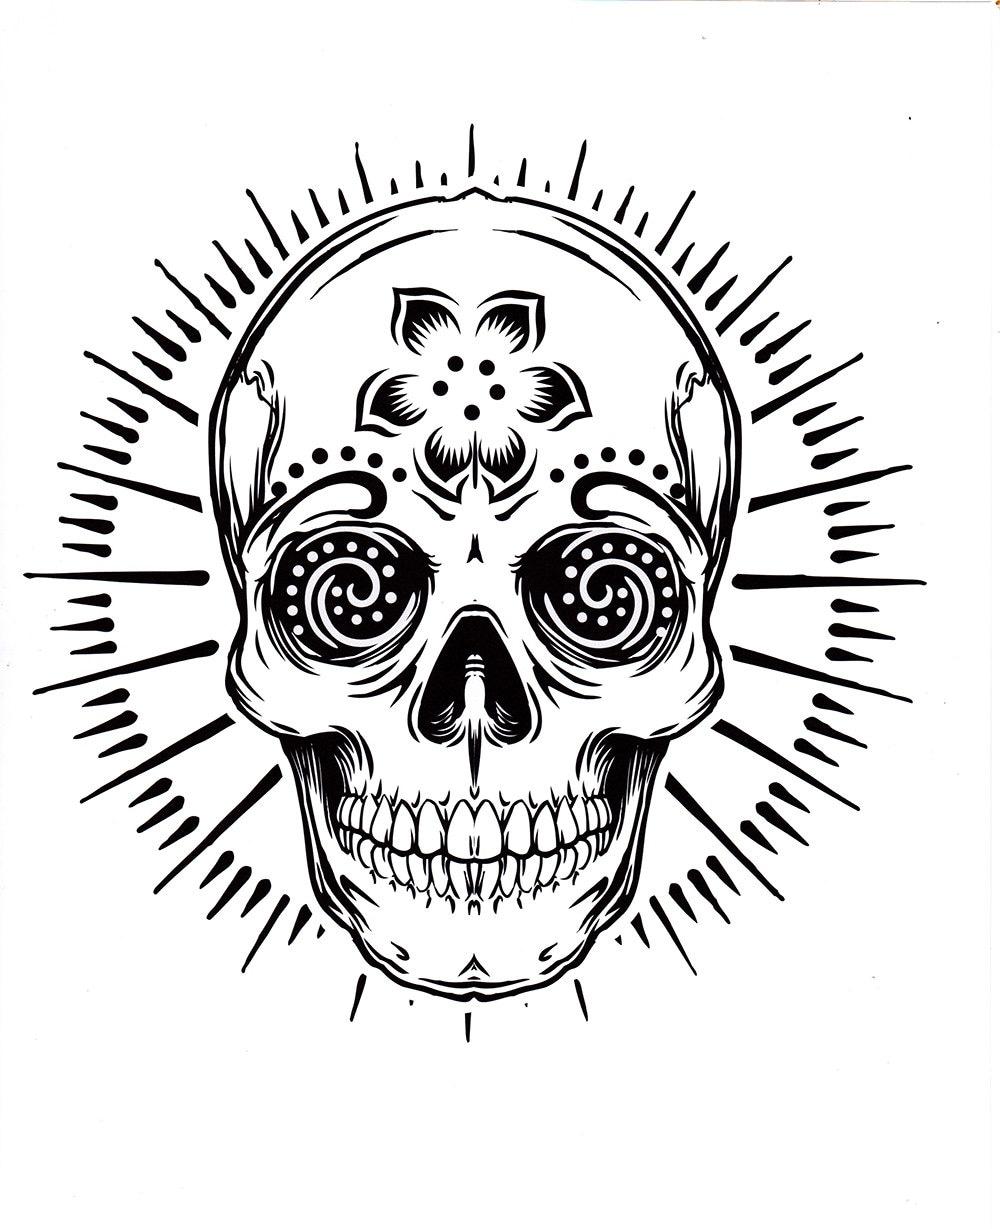 cinco diferentes azúcar cráneo tatuaje dibujos para colorear   Etsy